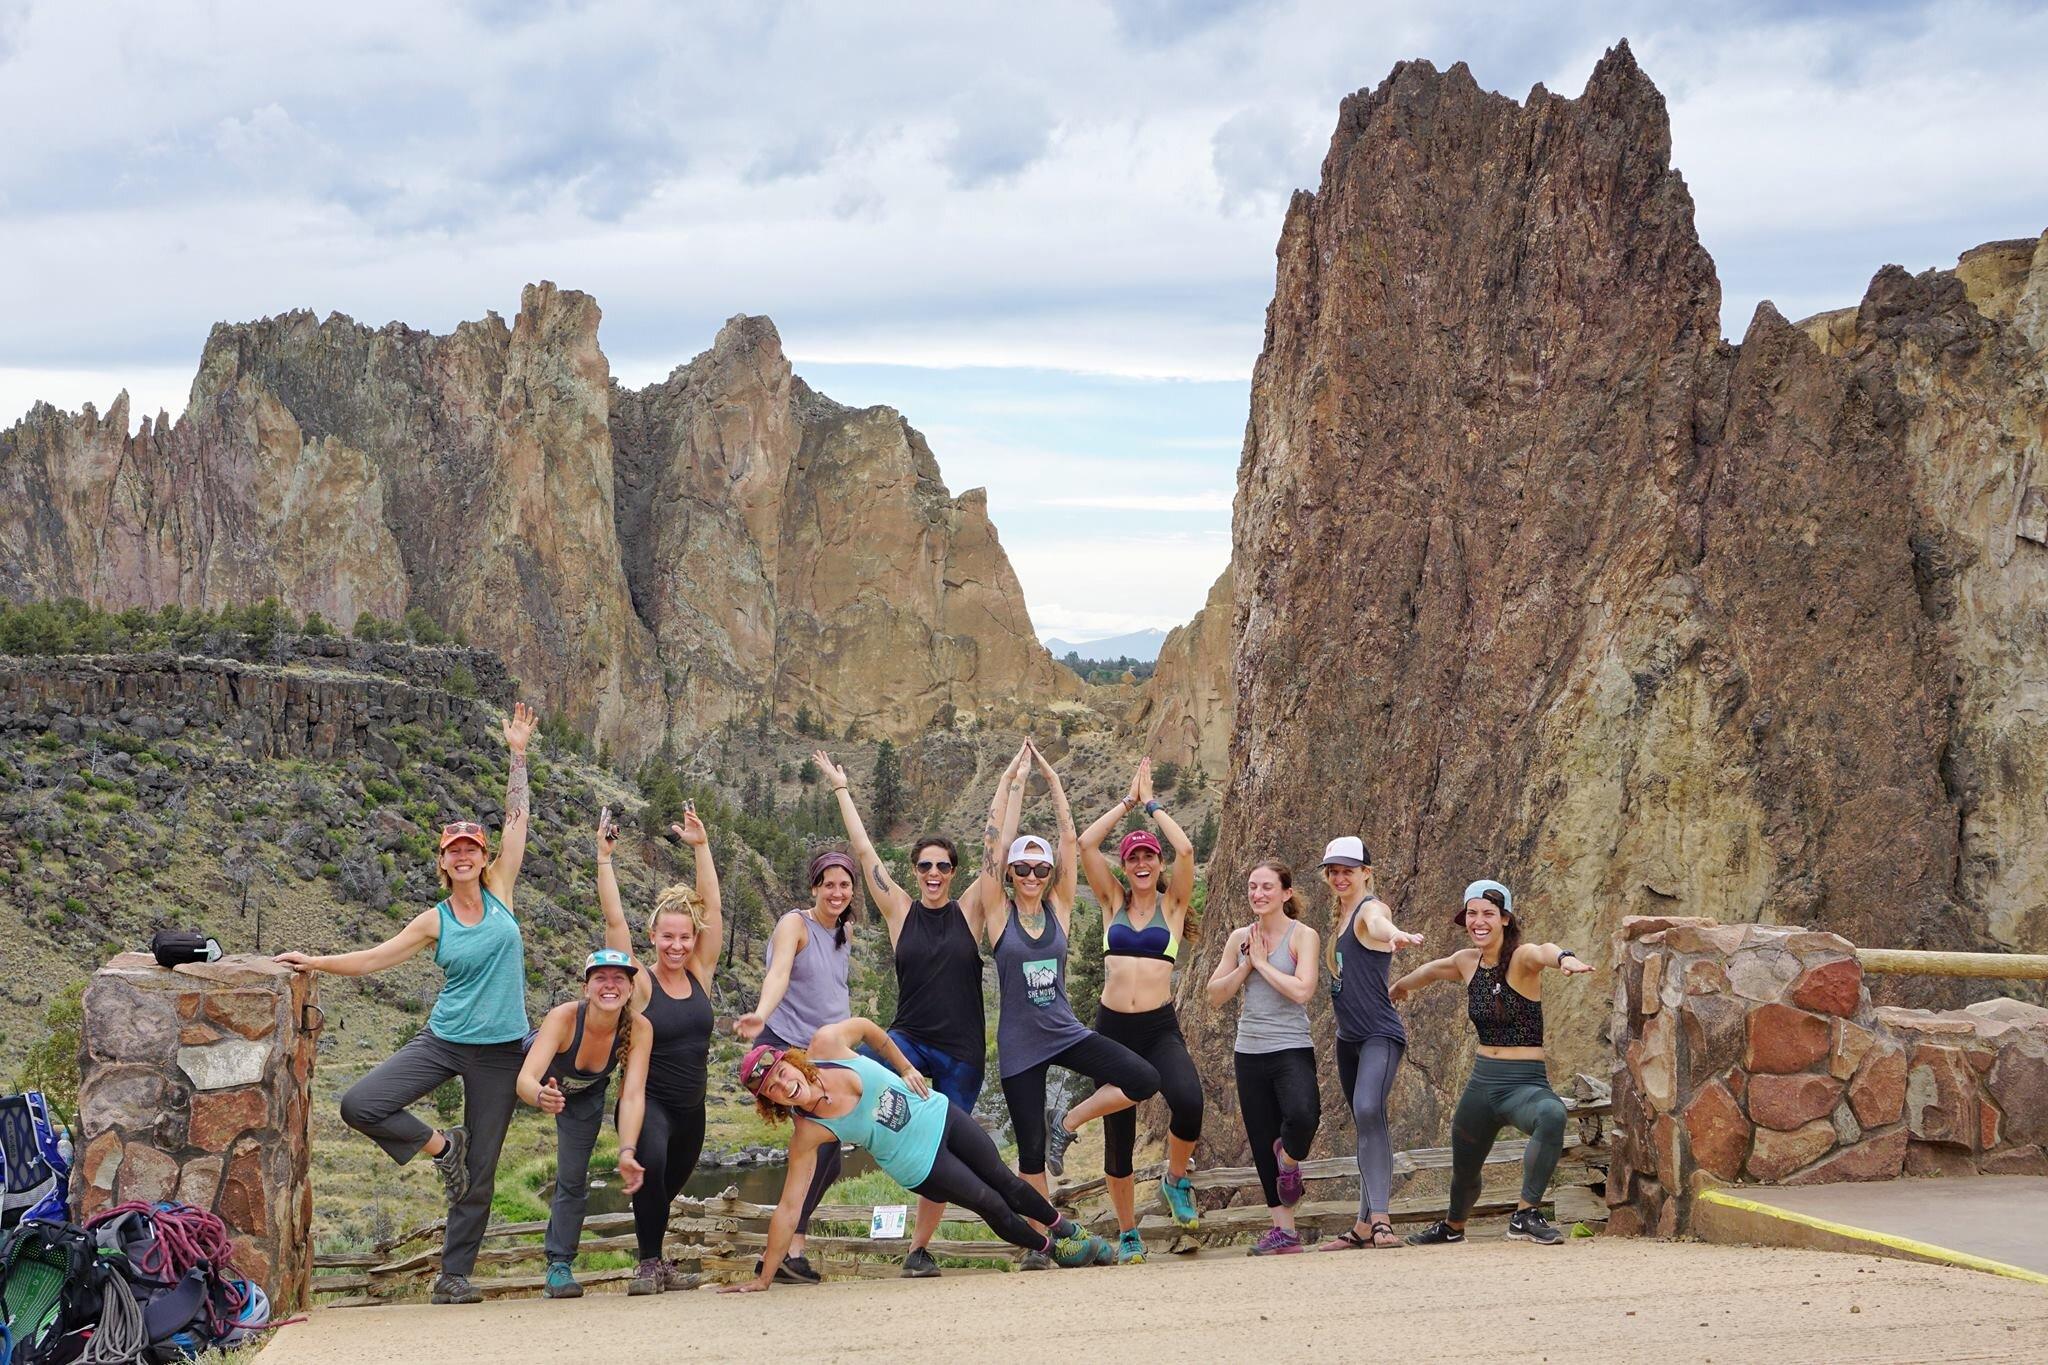 Female Climbing Mentors - She Moves Mountains